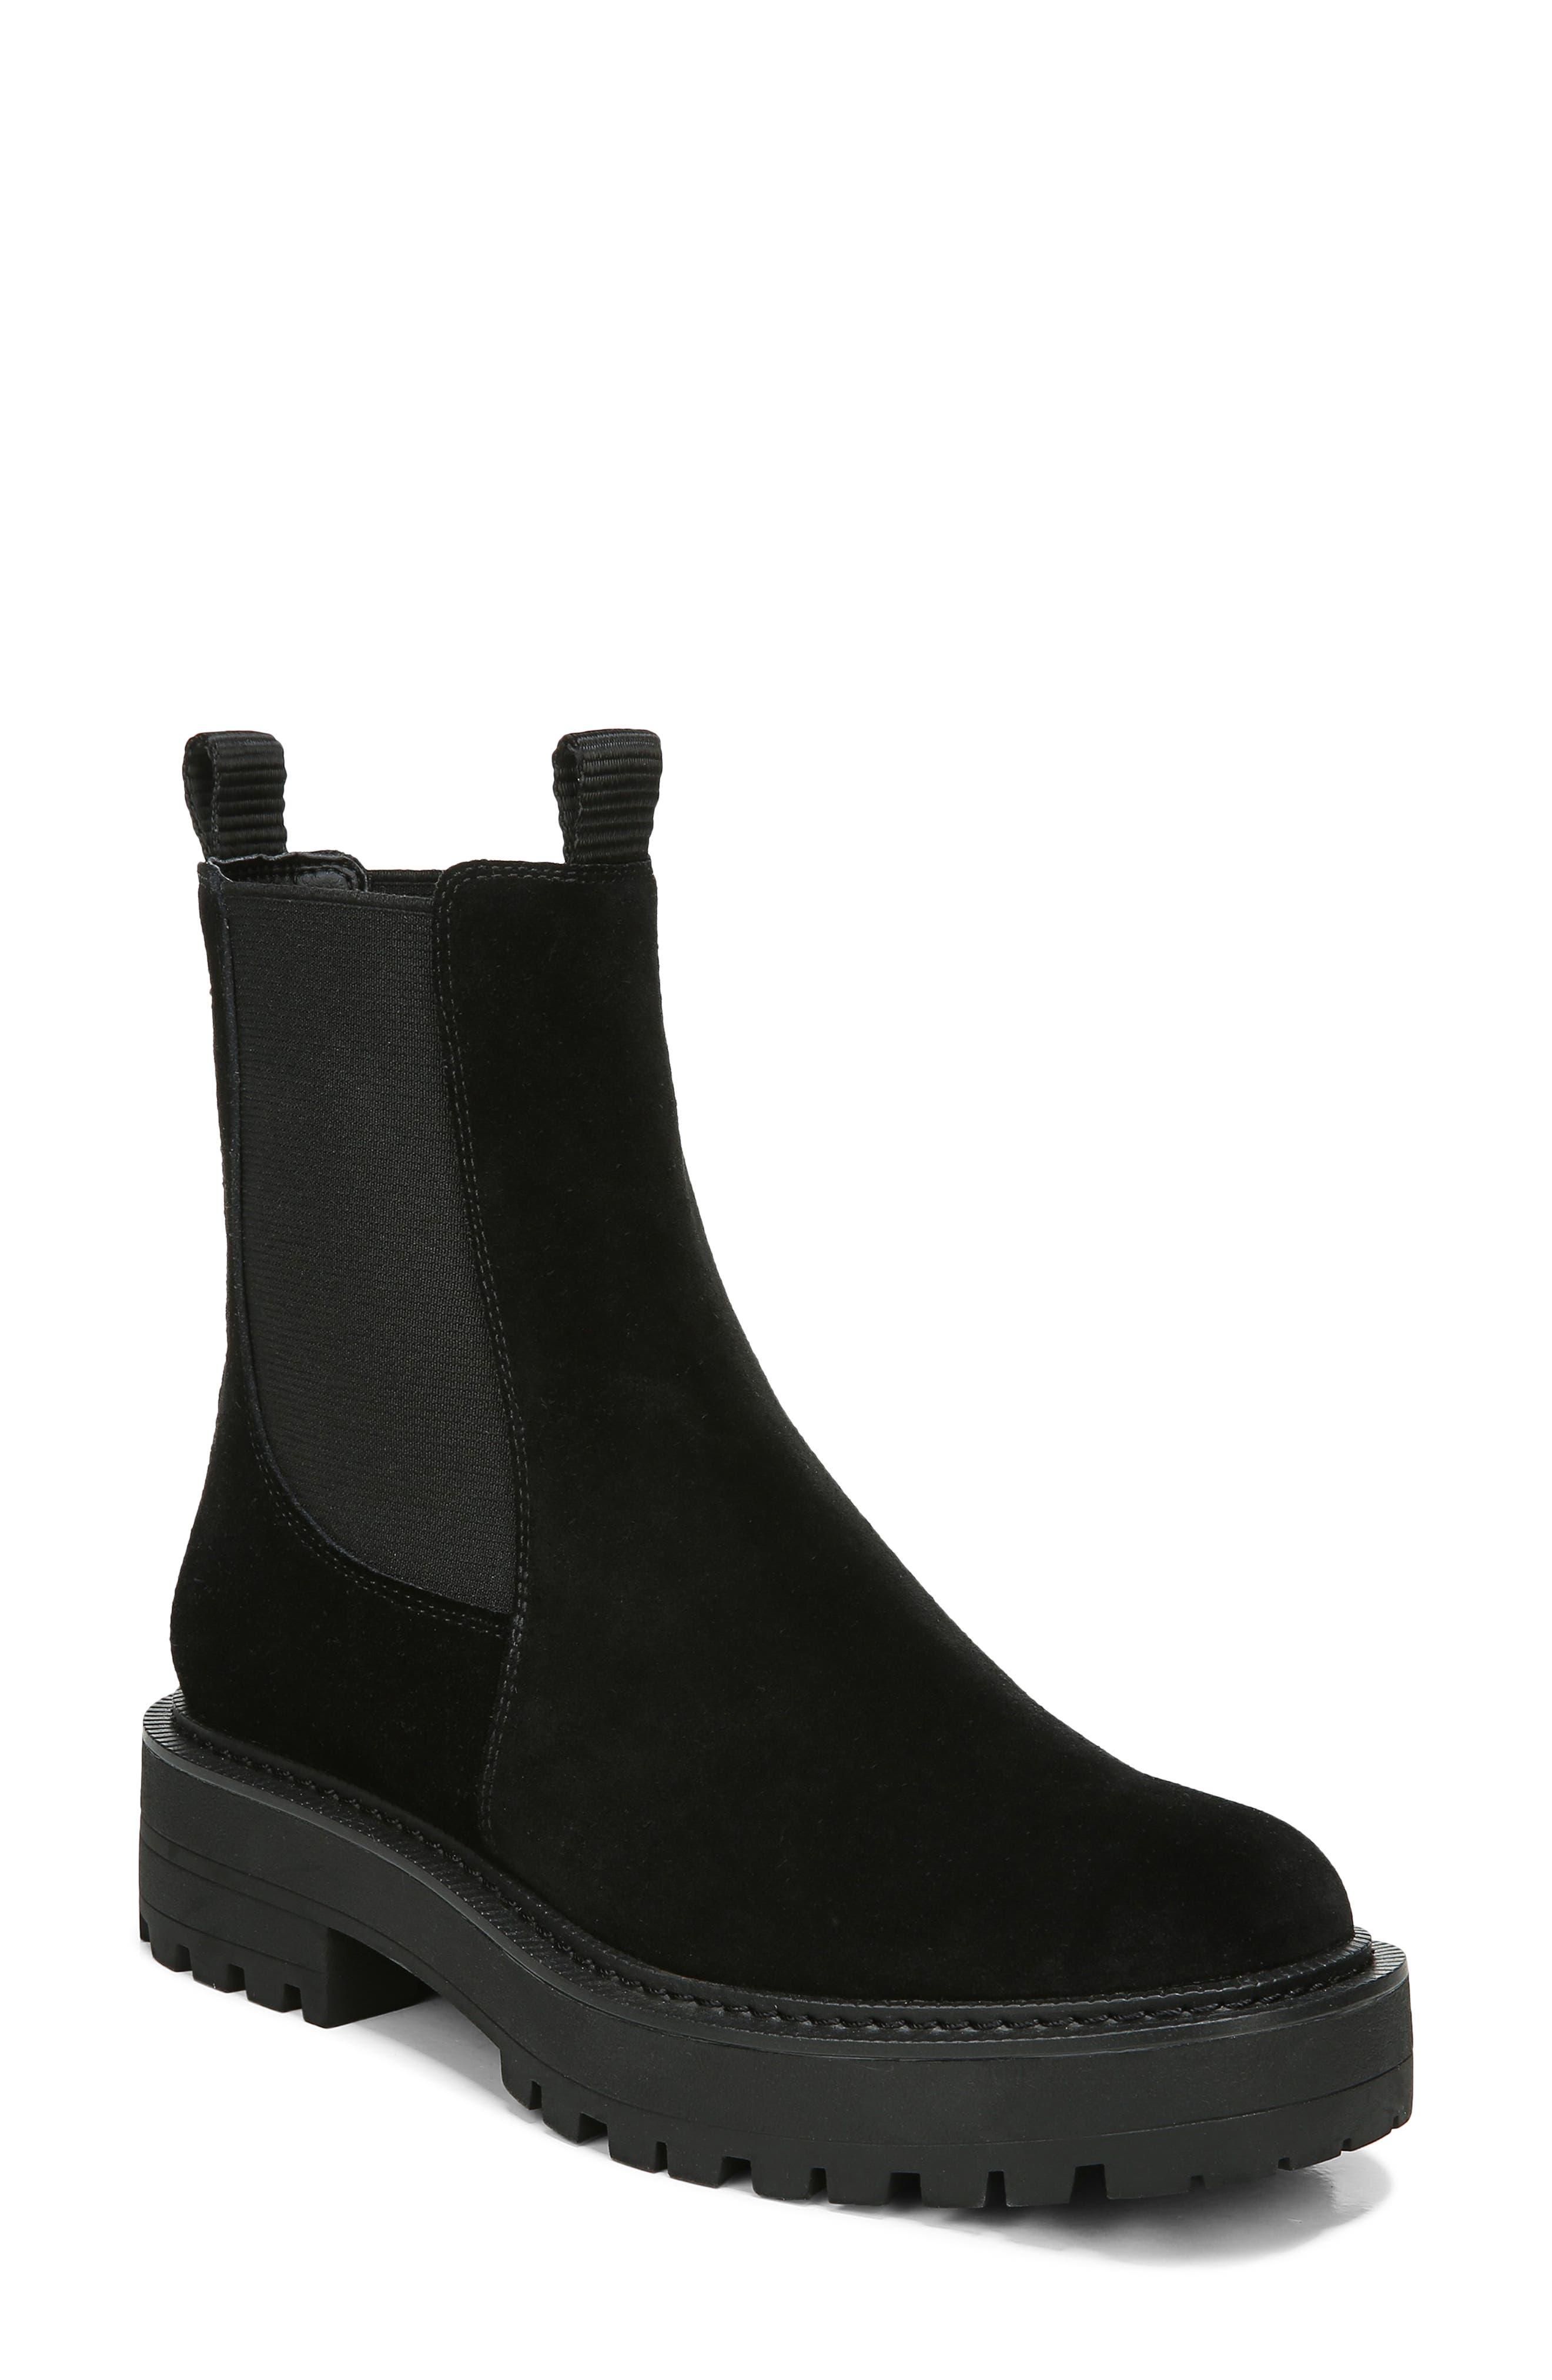 New Ladies Black Low Wedge Heel Ankle Zip Chelsea Shoes Boots Sizes 3 4 5 6 7 8